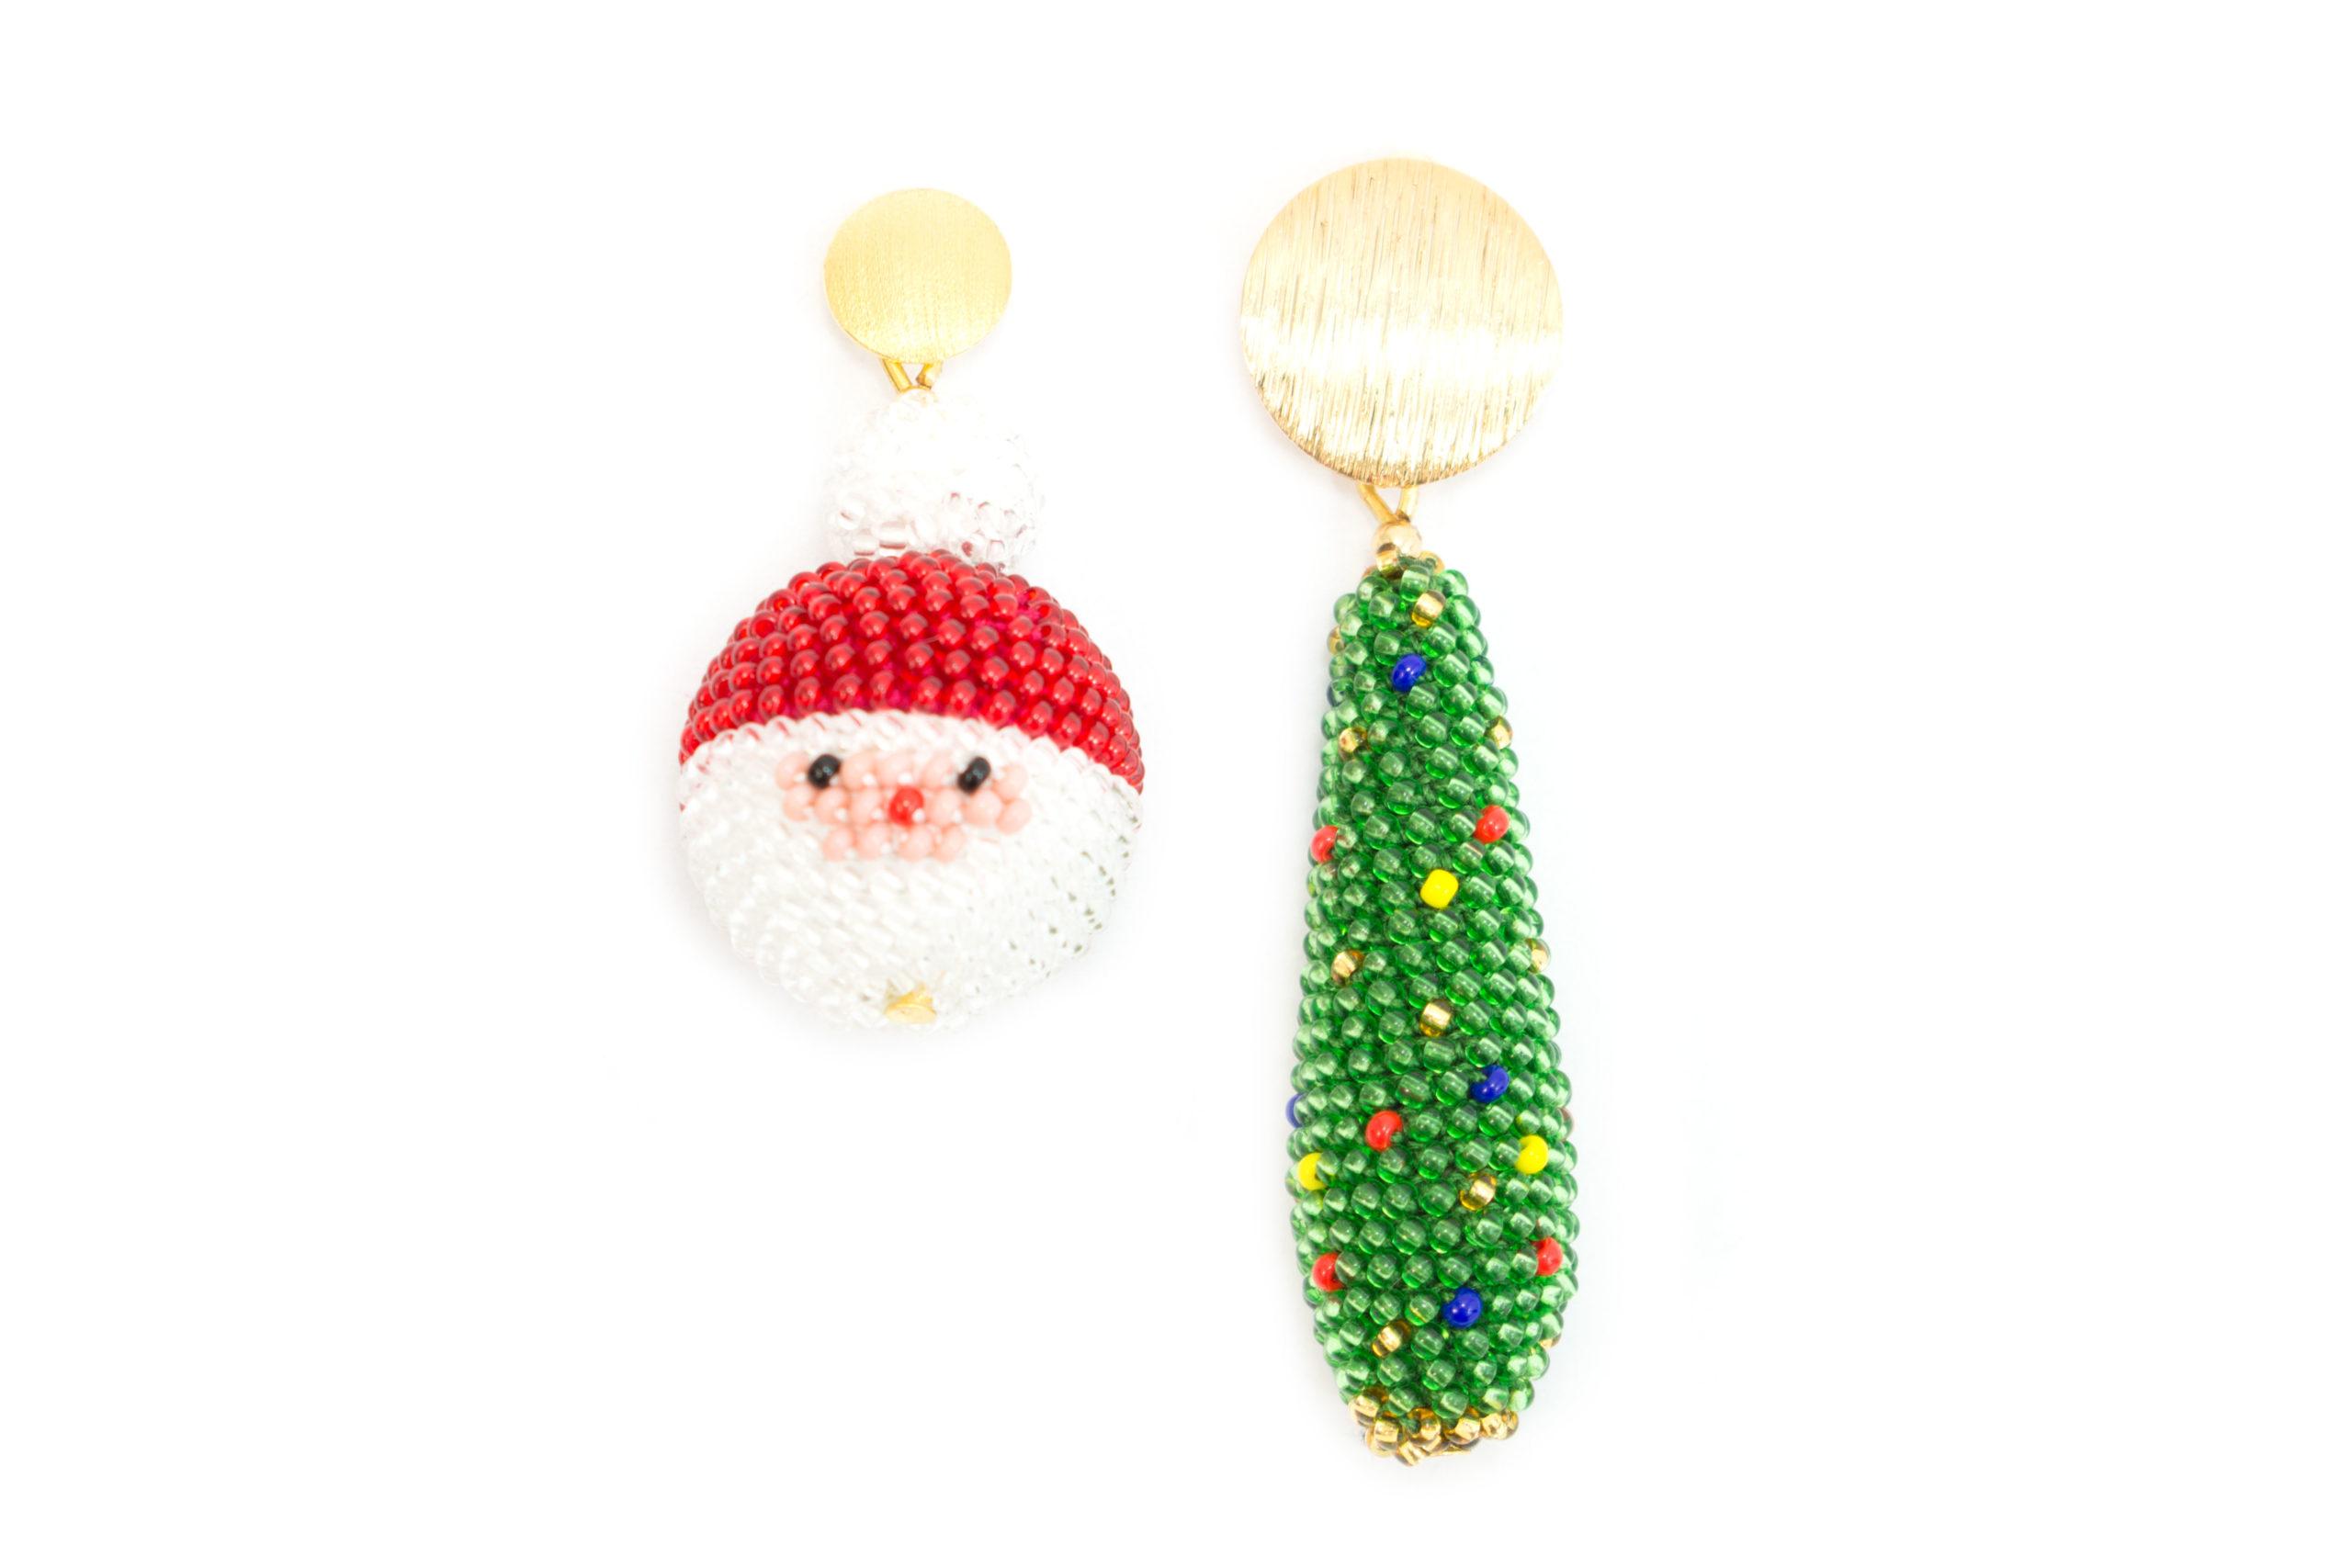 Christmastree-Snowman-Gold-Stecker.web